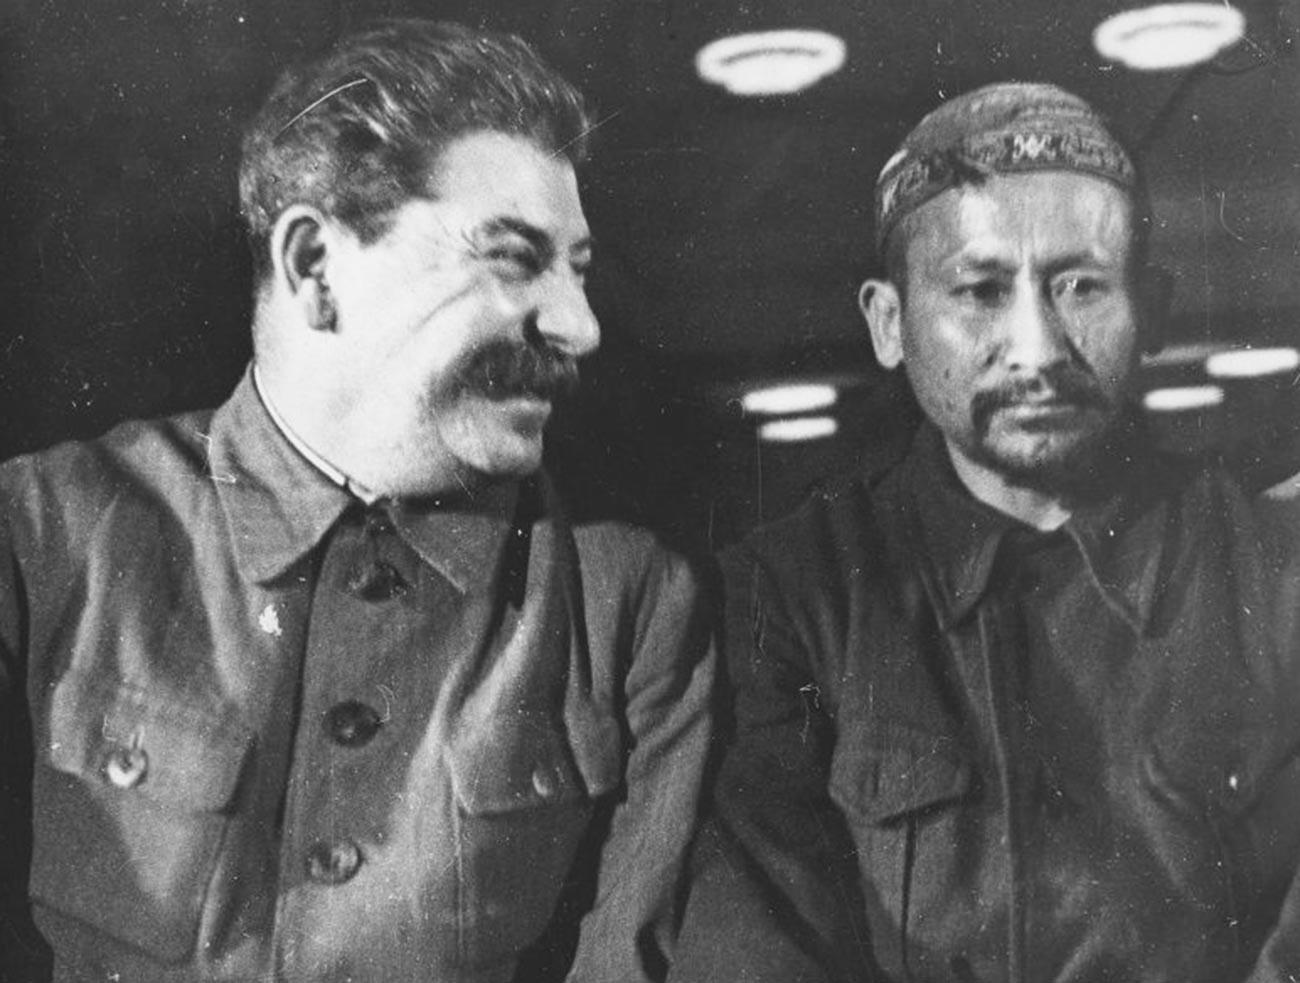 Joseph Staline